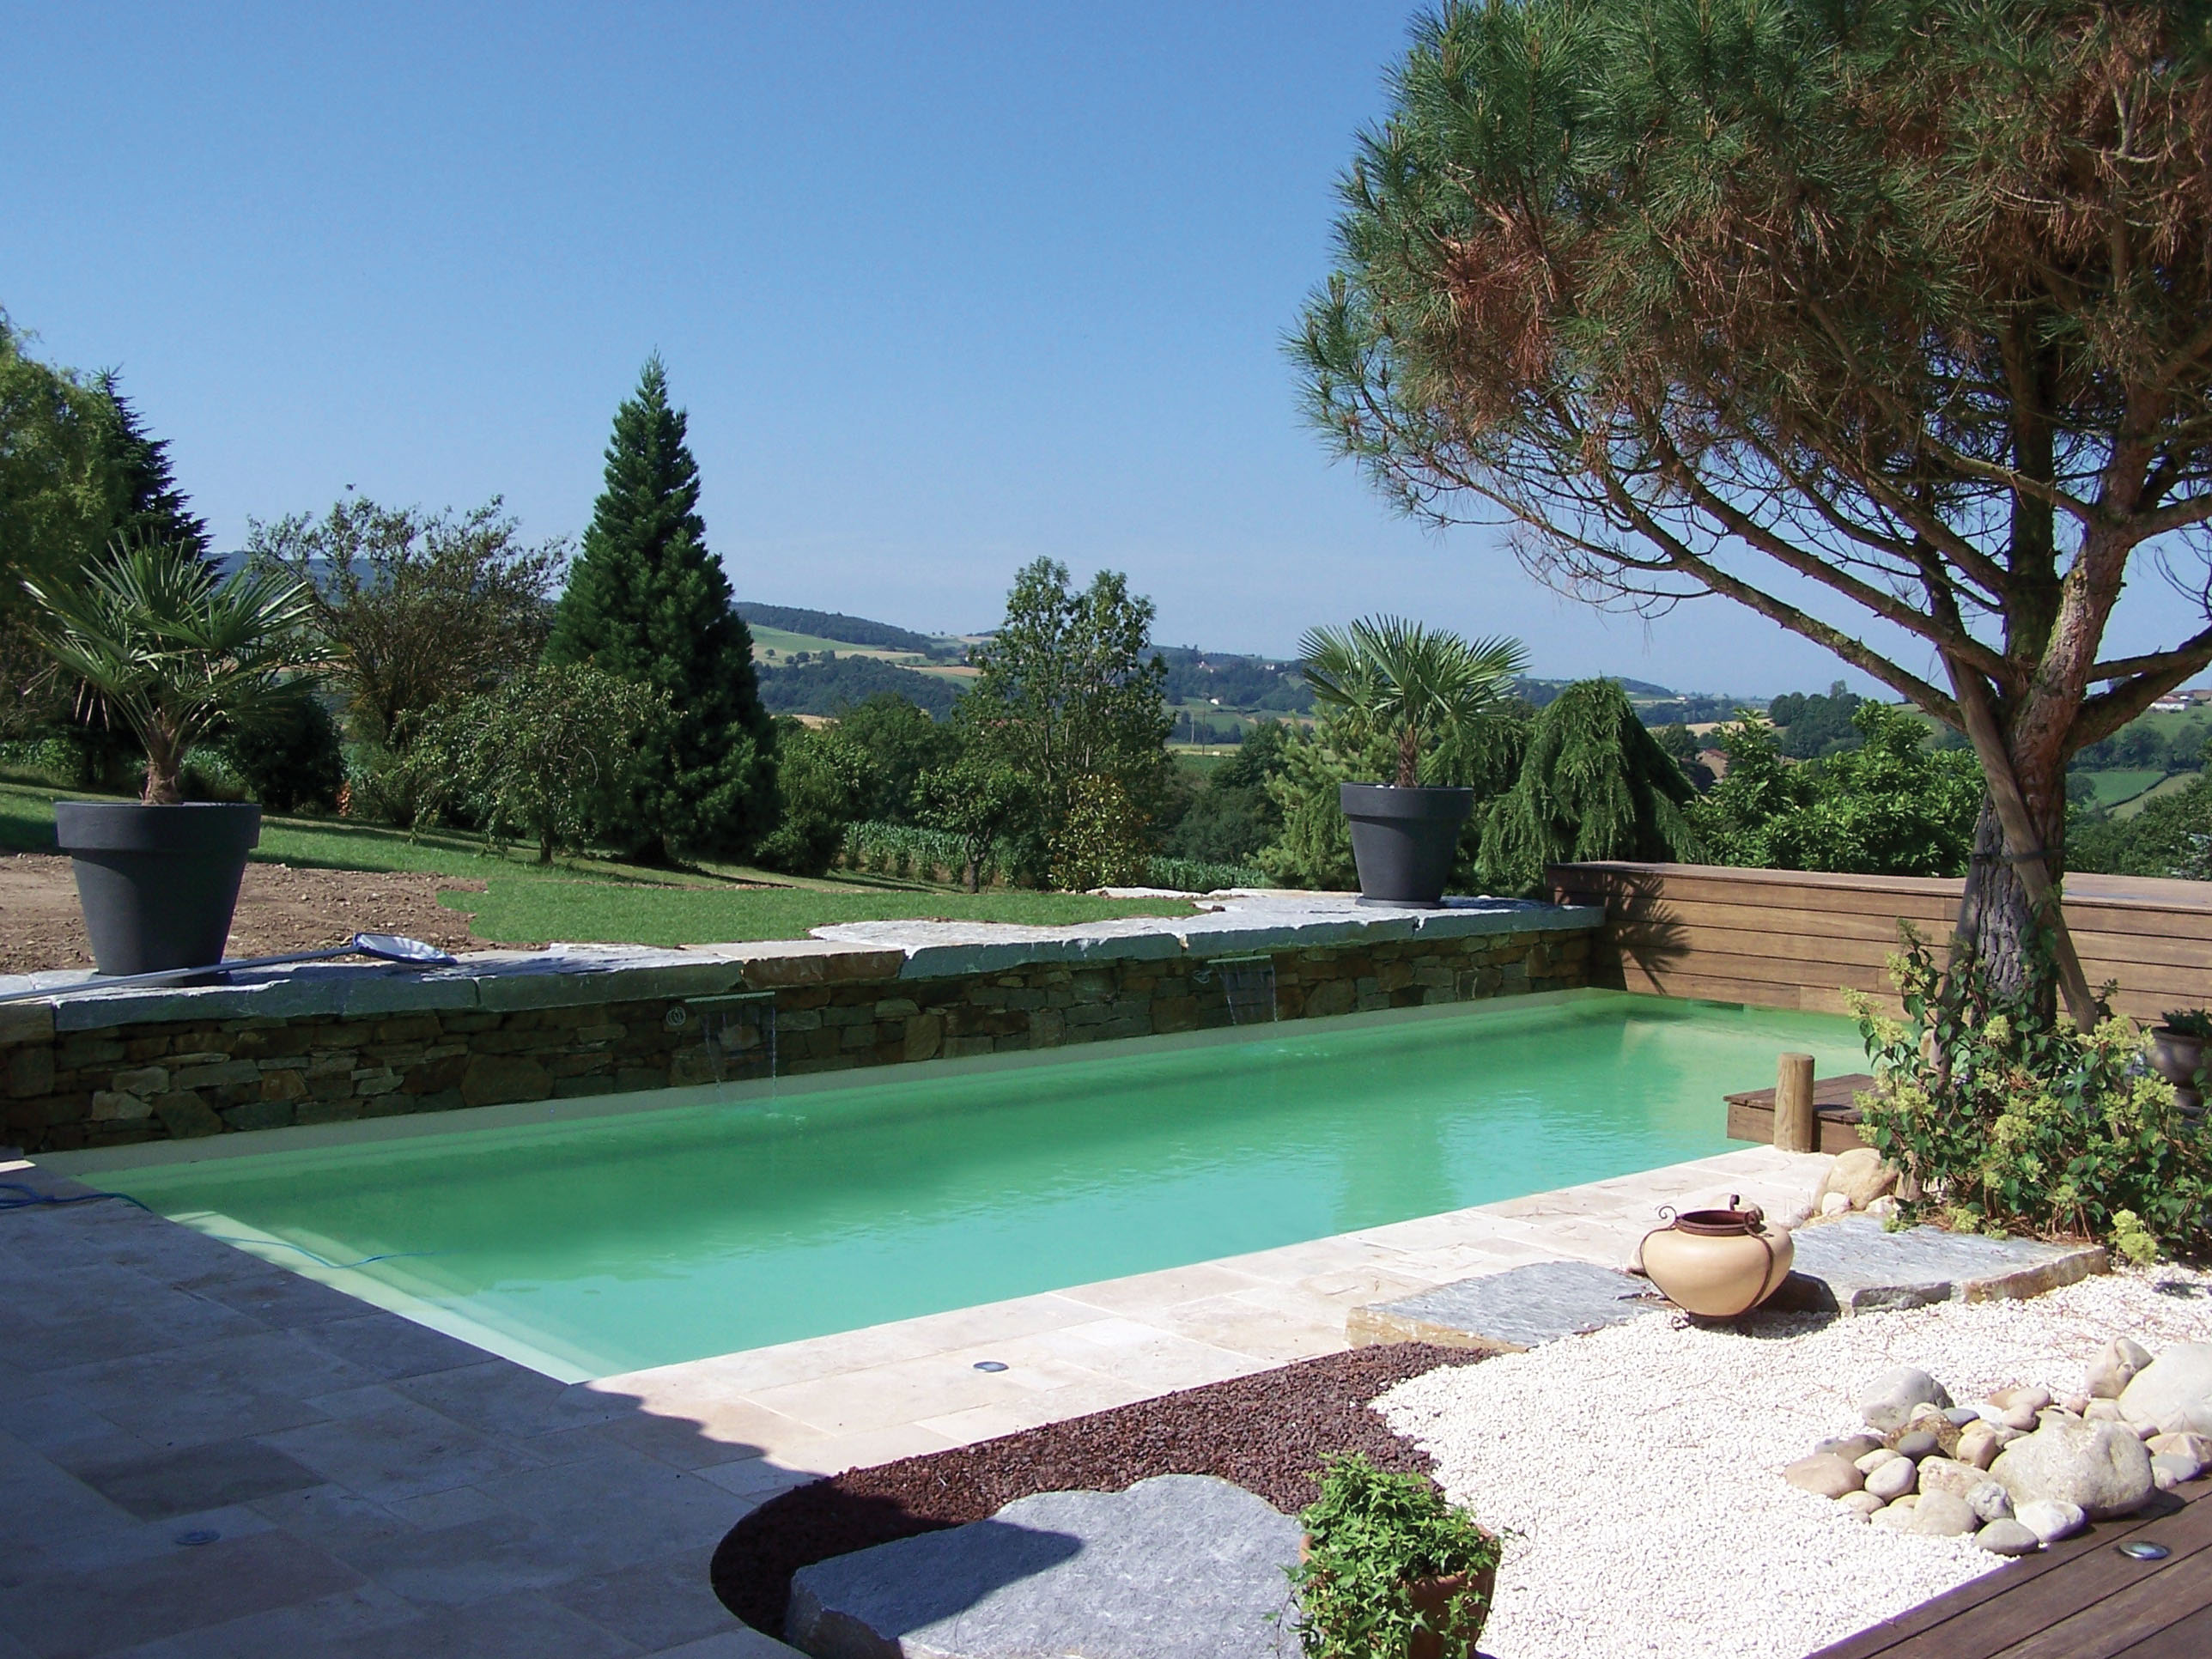 sweetline fabricant installateur de piscine france filiale